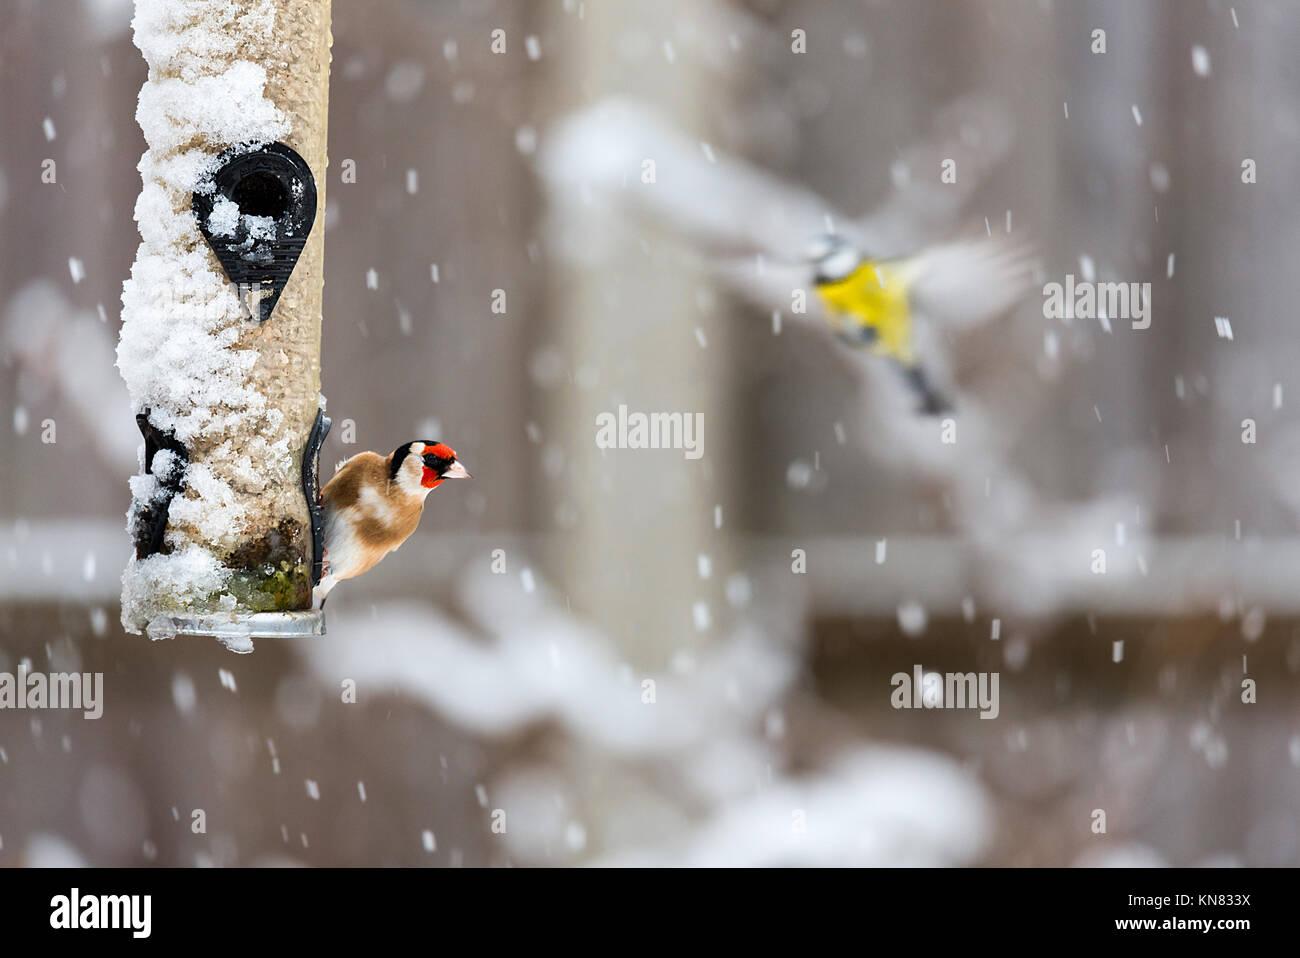 warwickshire-uk-10th-dec-2017-winter-sno